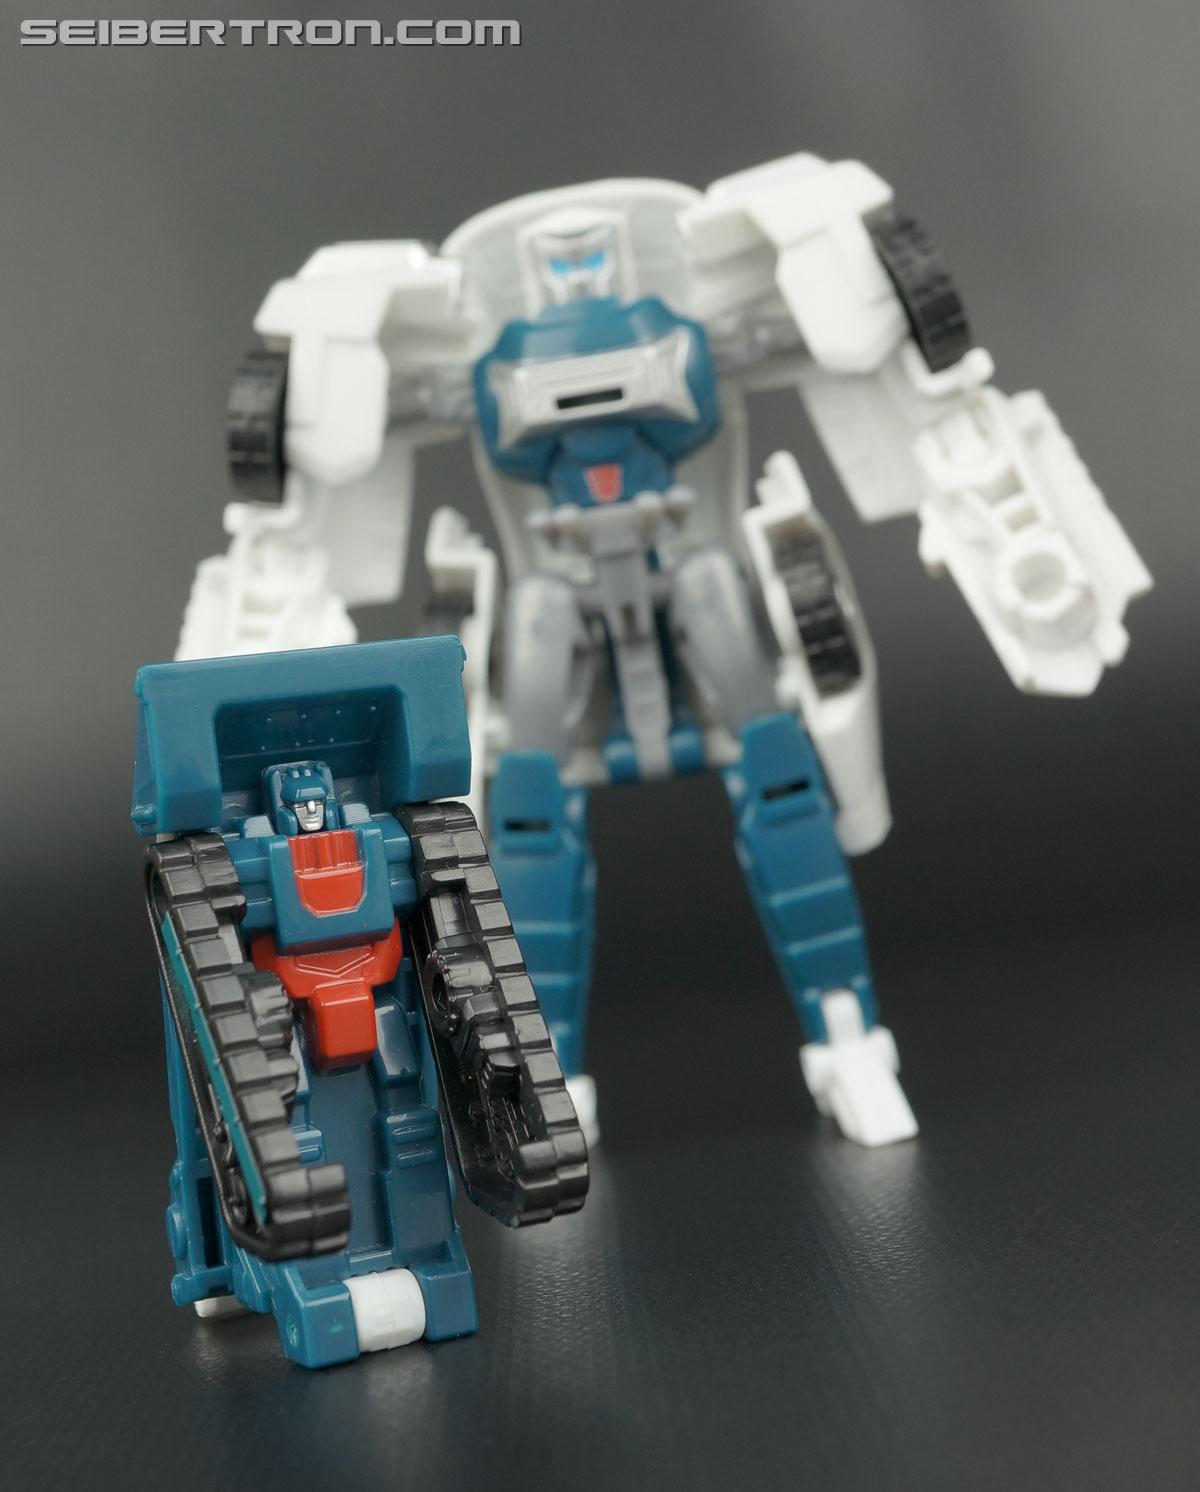 Transformers Legends Groundshaker (Image #66 of 66)